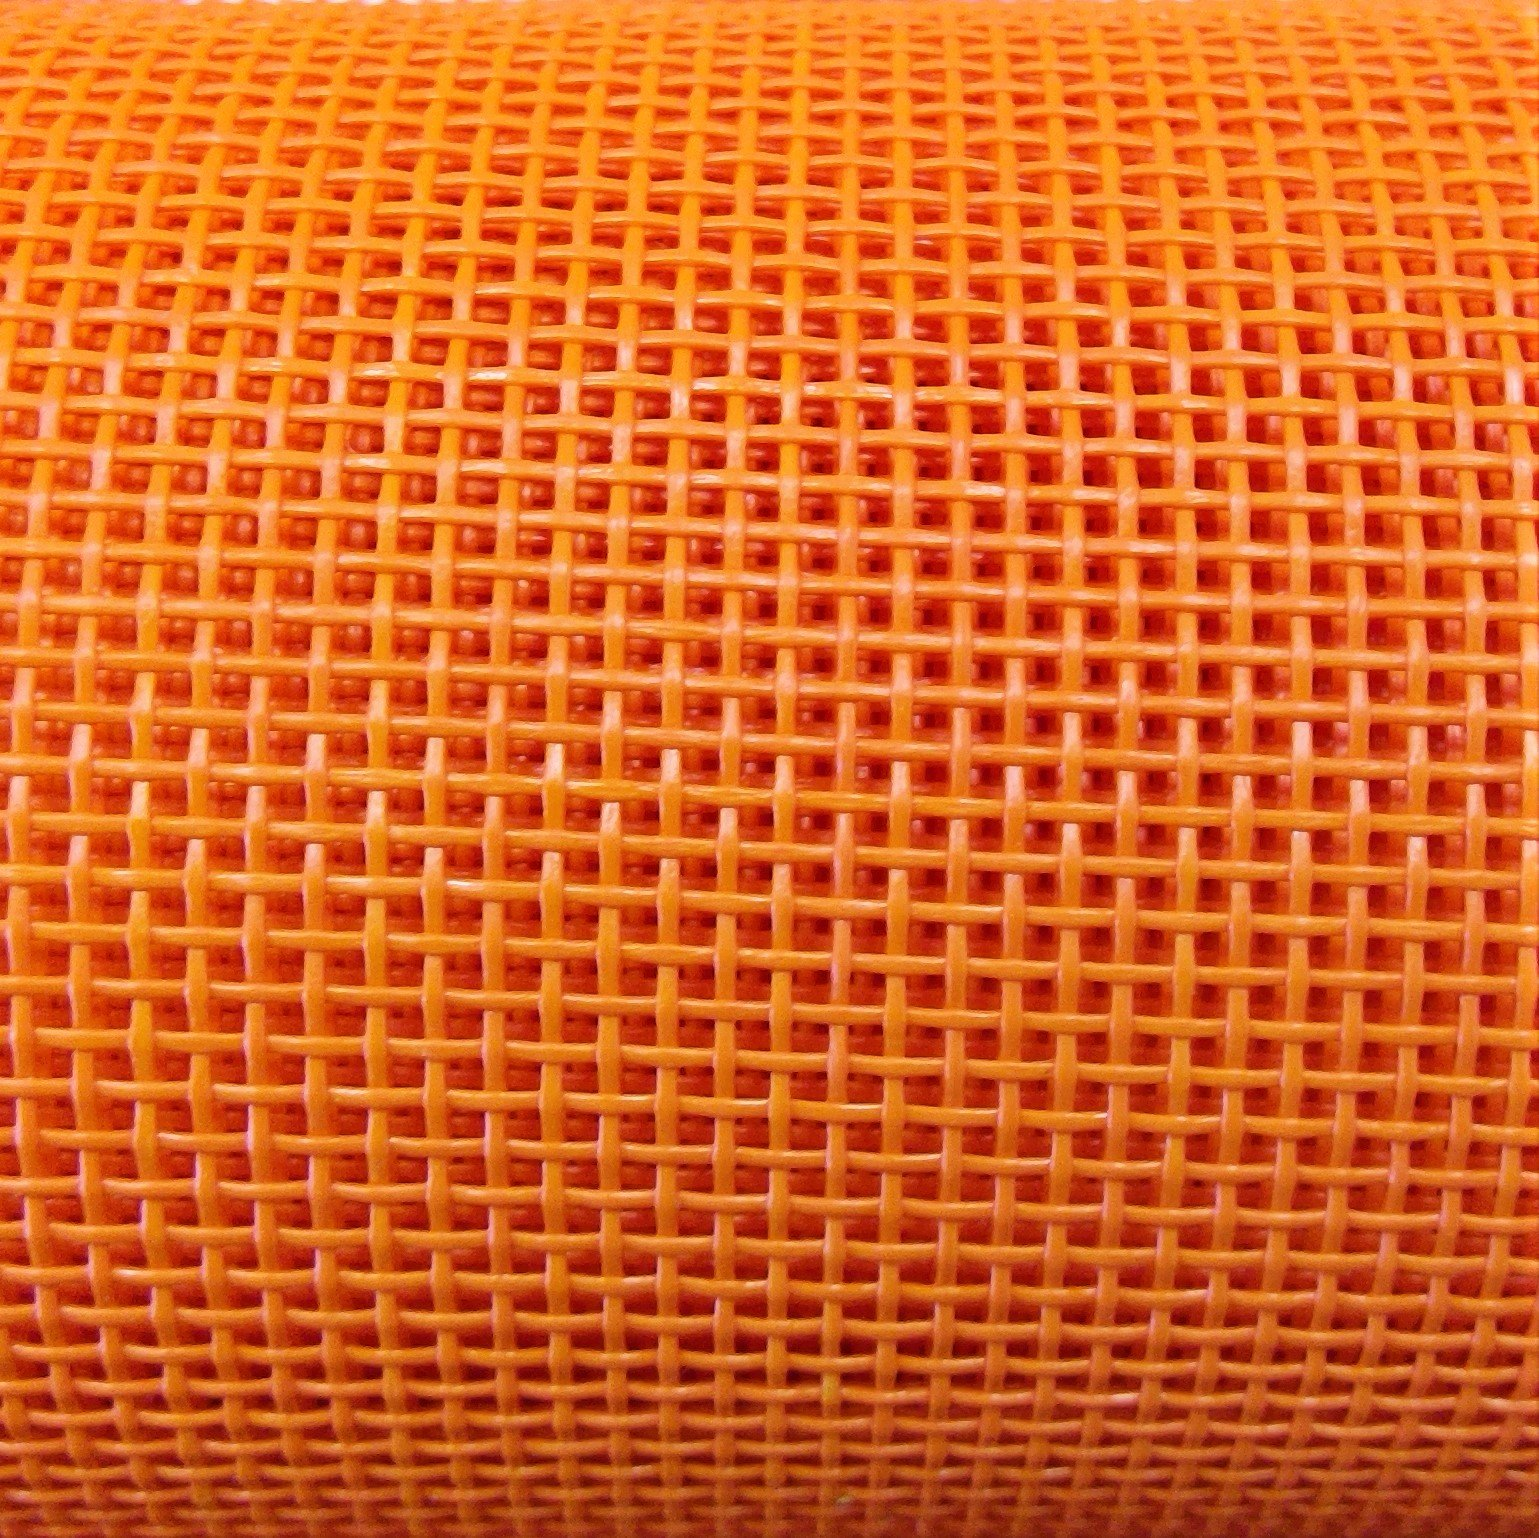 Vinyl Mesh 36 wide, Orange